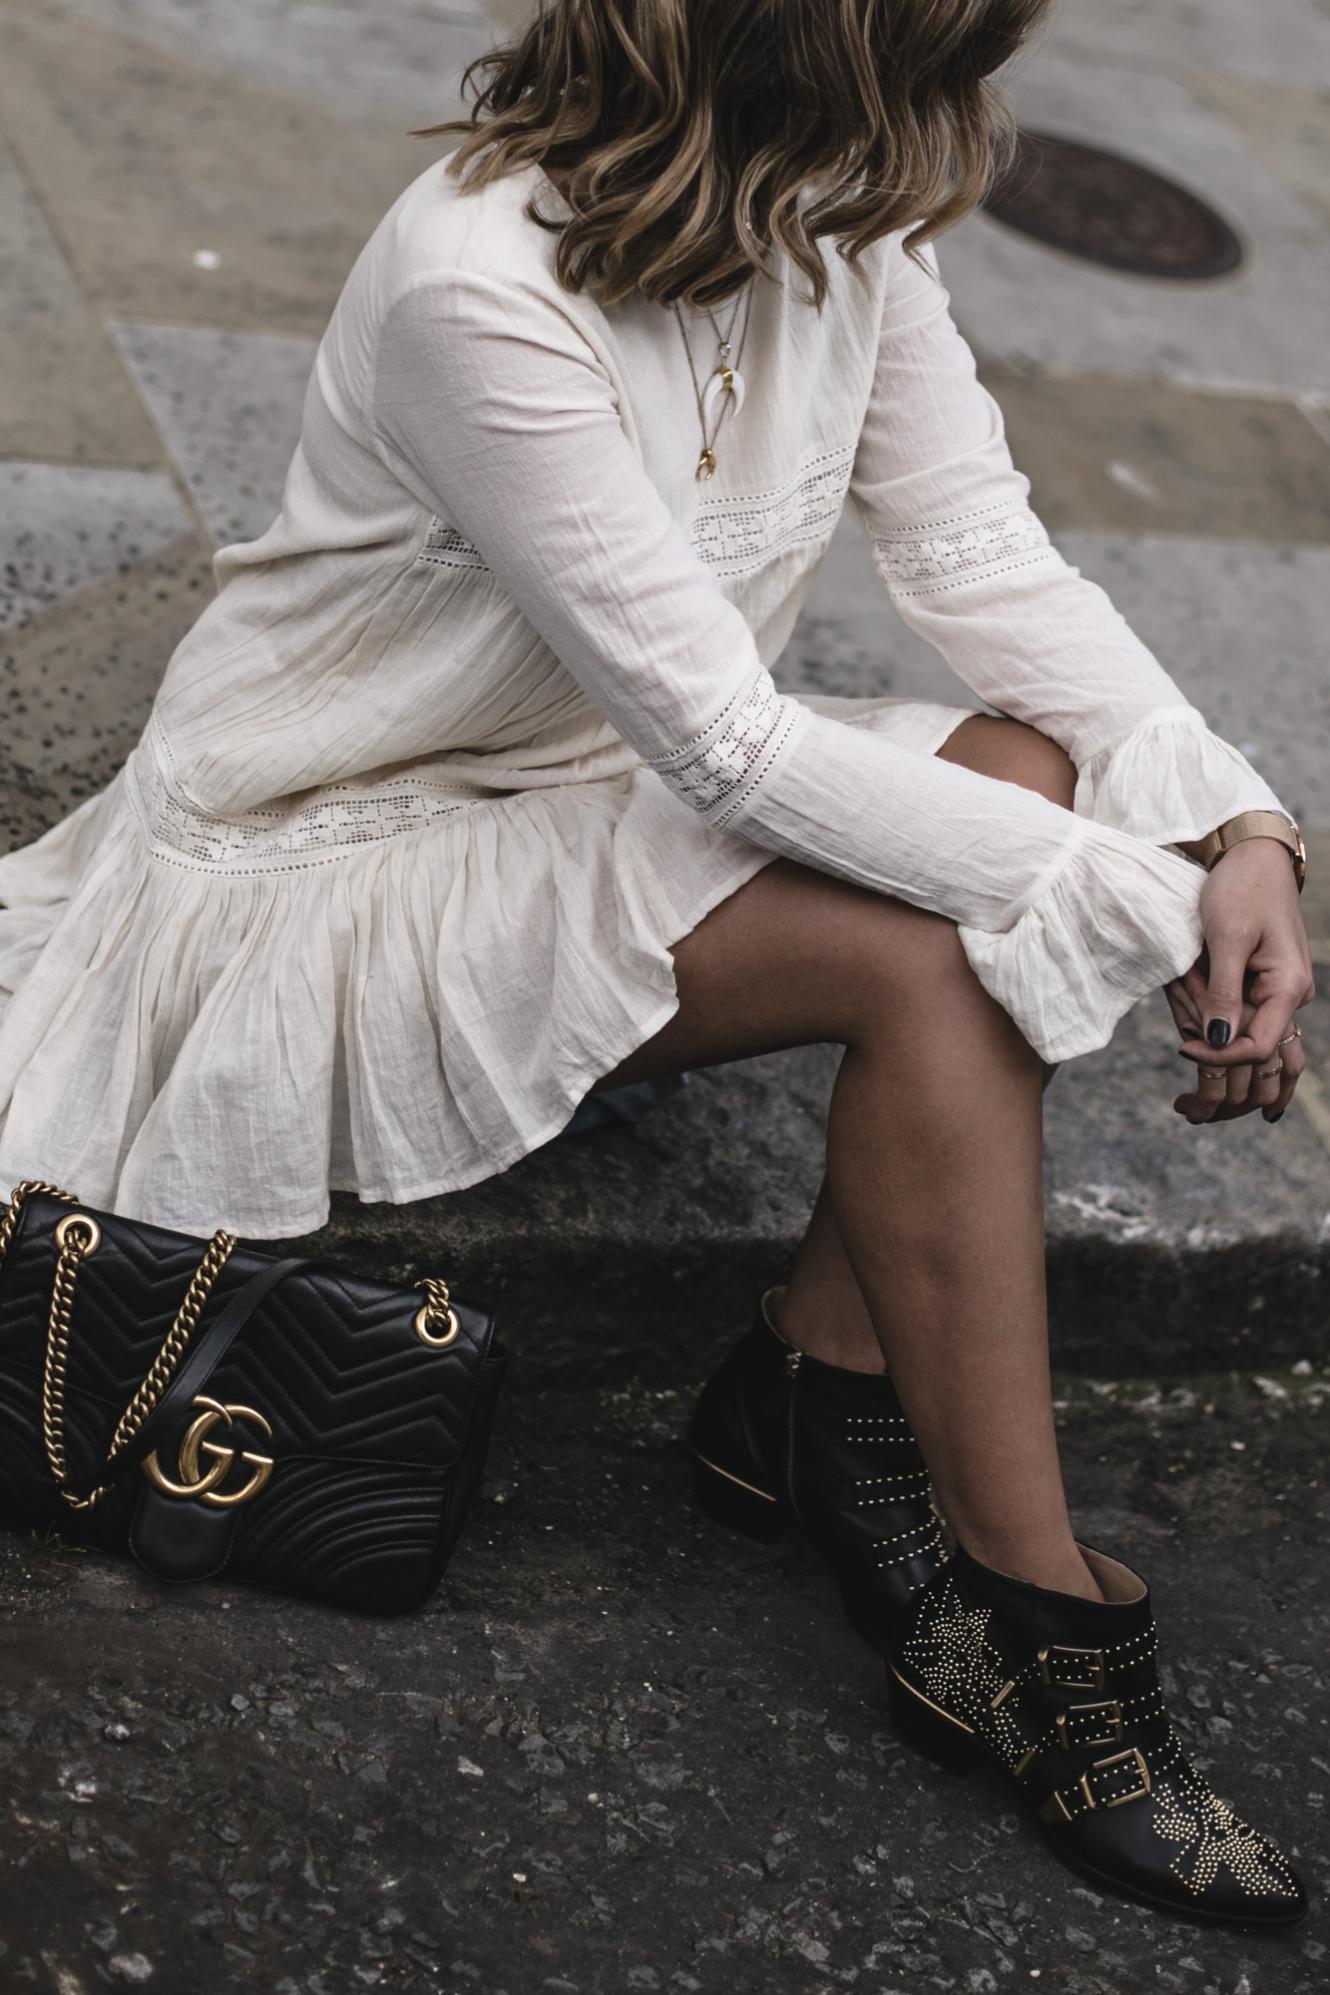 Emma Hill wearing Tularosa boho mini dress, Chloe Susanna boots, Gucci Marmont bag, Summer outfit, festival style